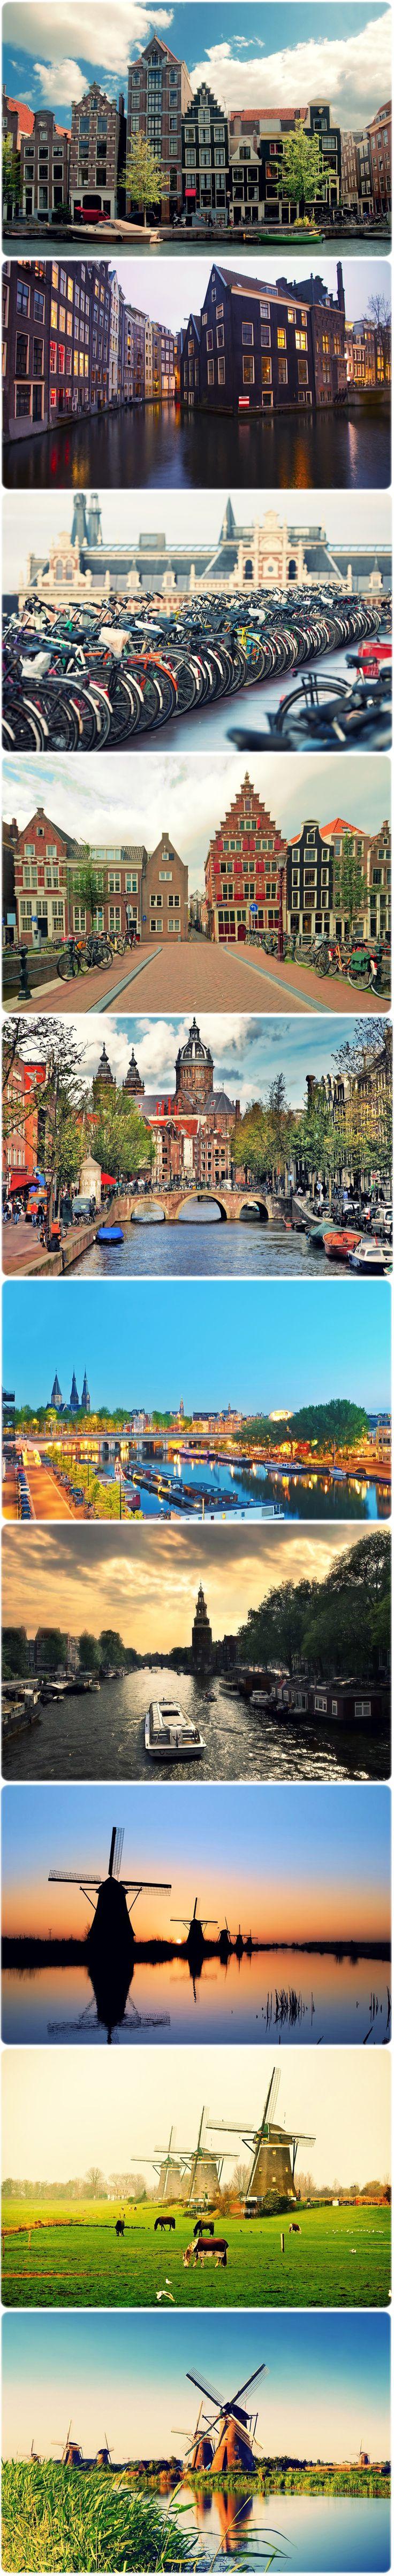 Holland-liefde #suidafrika #zuidafrika #nederland #afrikaans #nederlands #reis #dutch